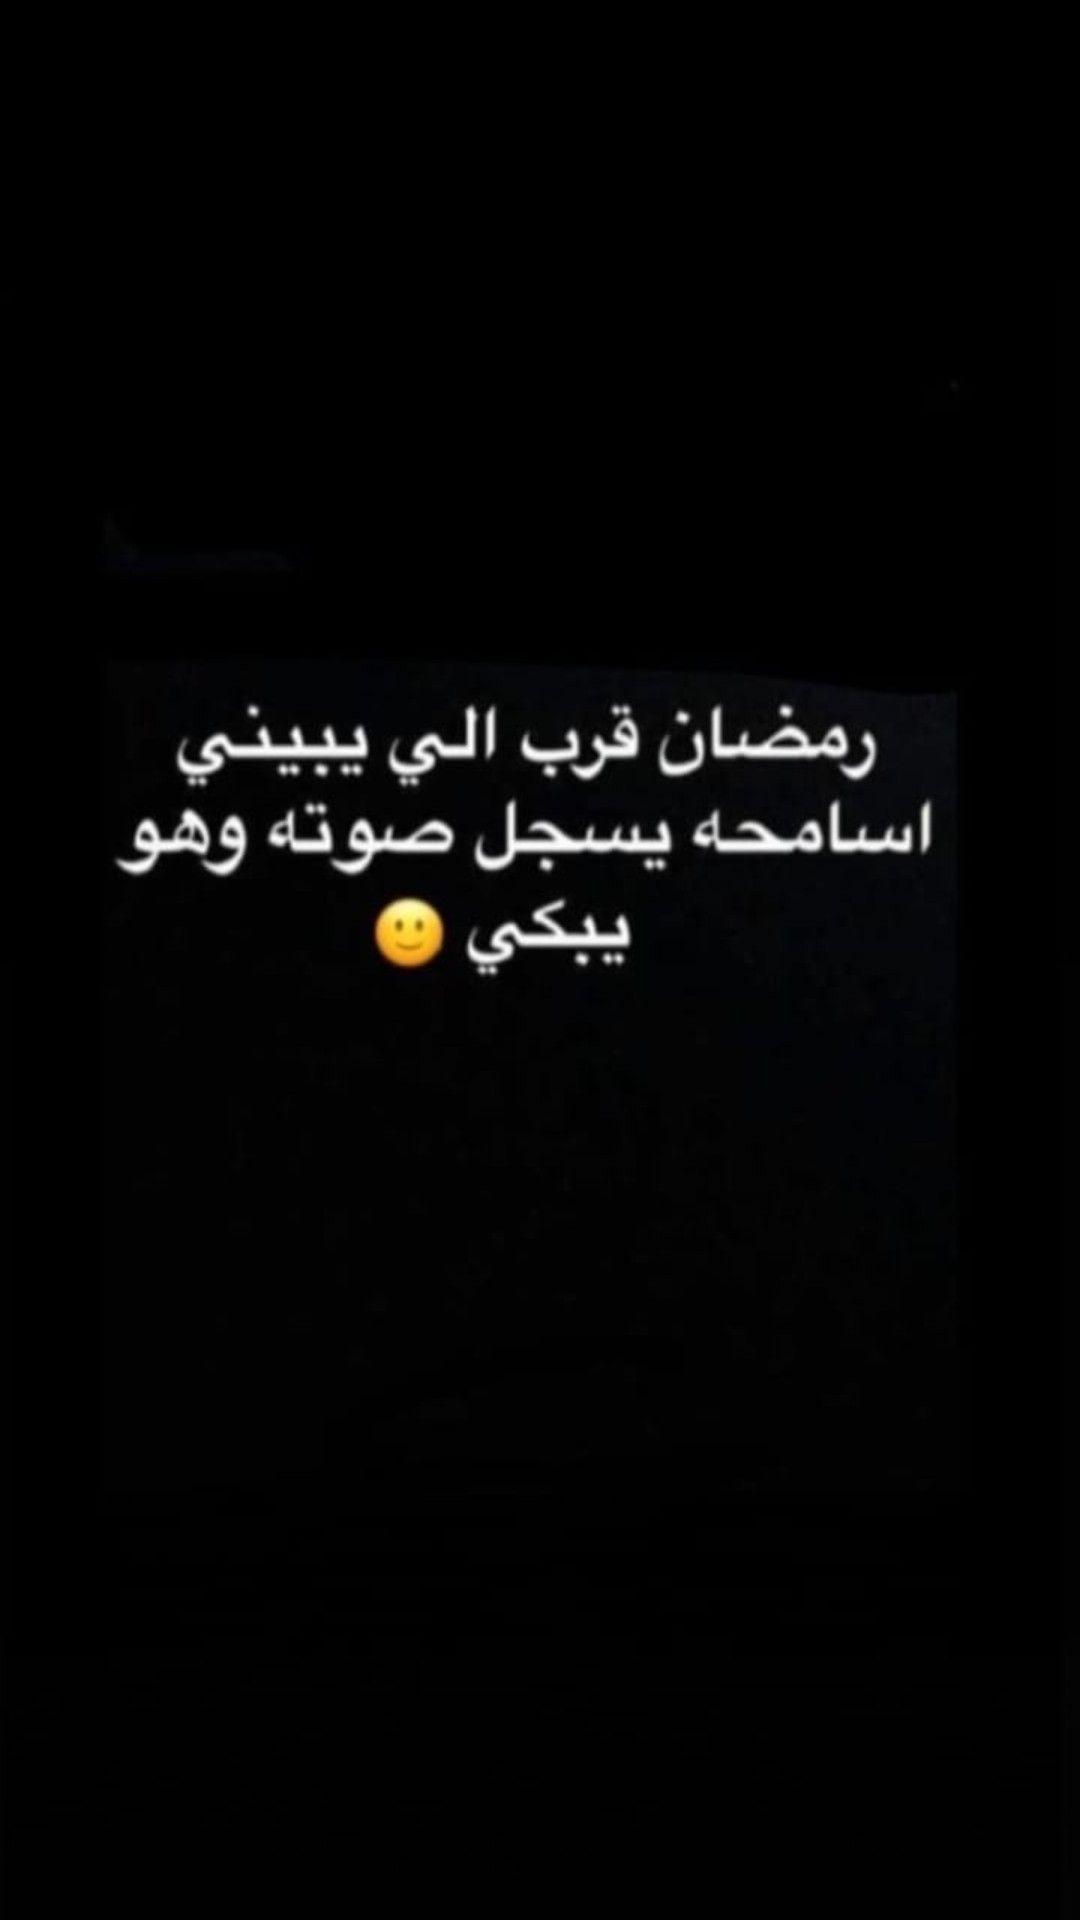 اوك In 2020 Funny Arabic Quotes Funny Words Mood Quotes